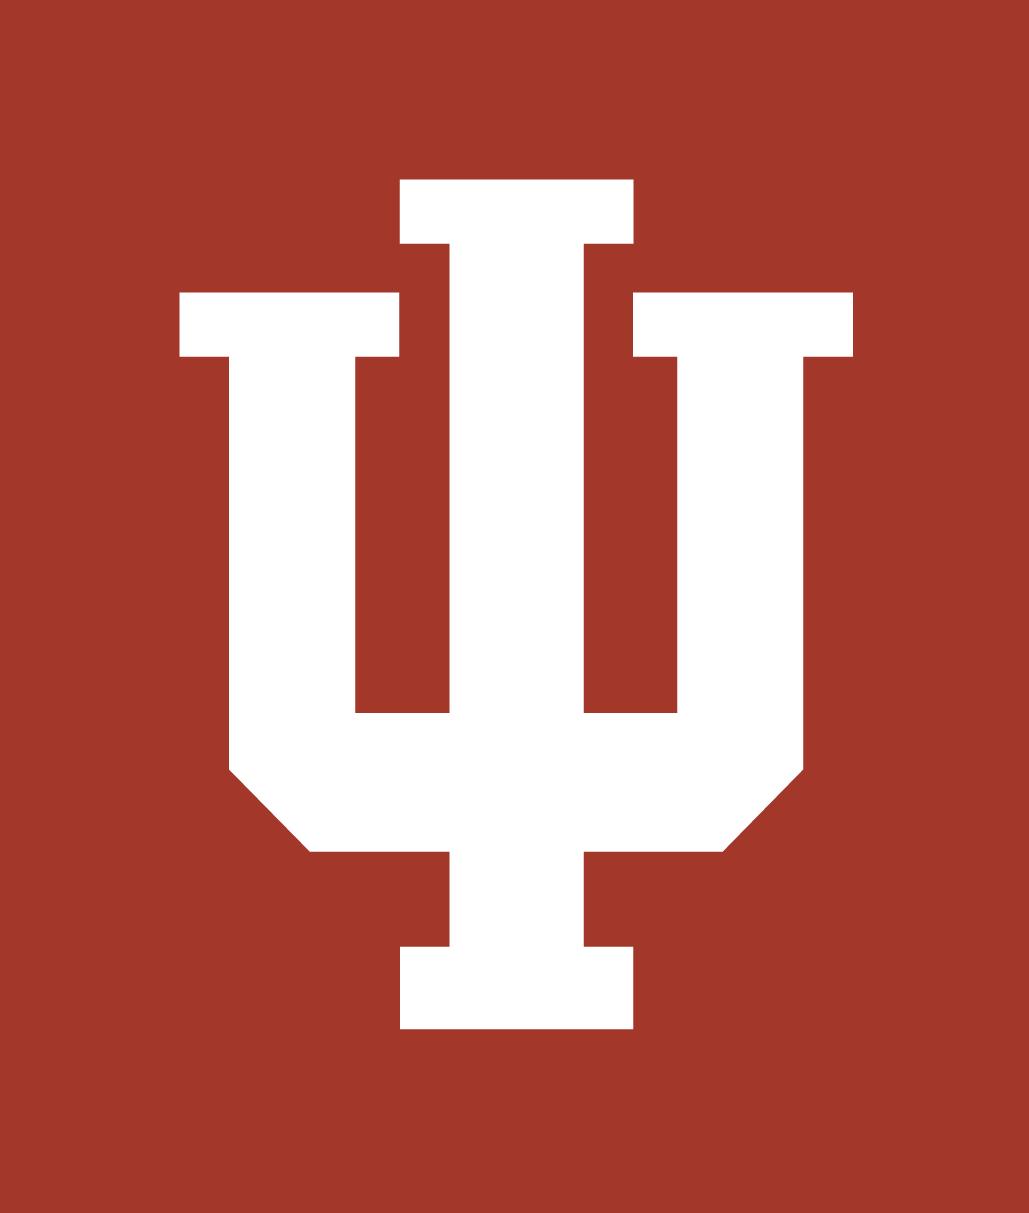 indiana-university-seeklogo.com